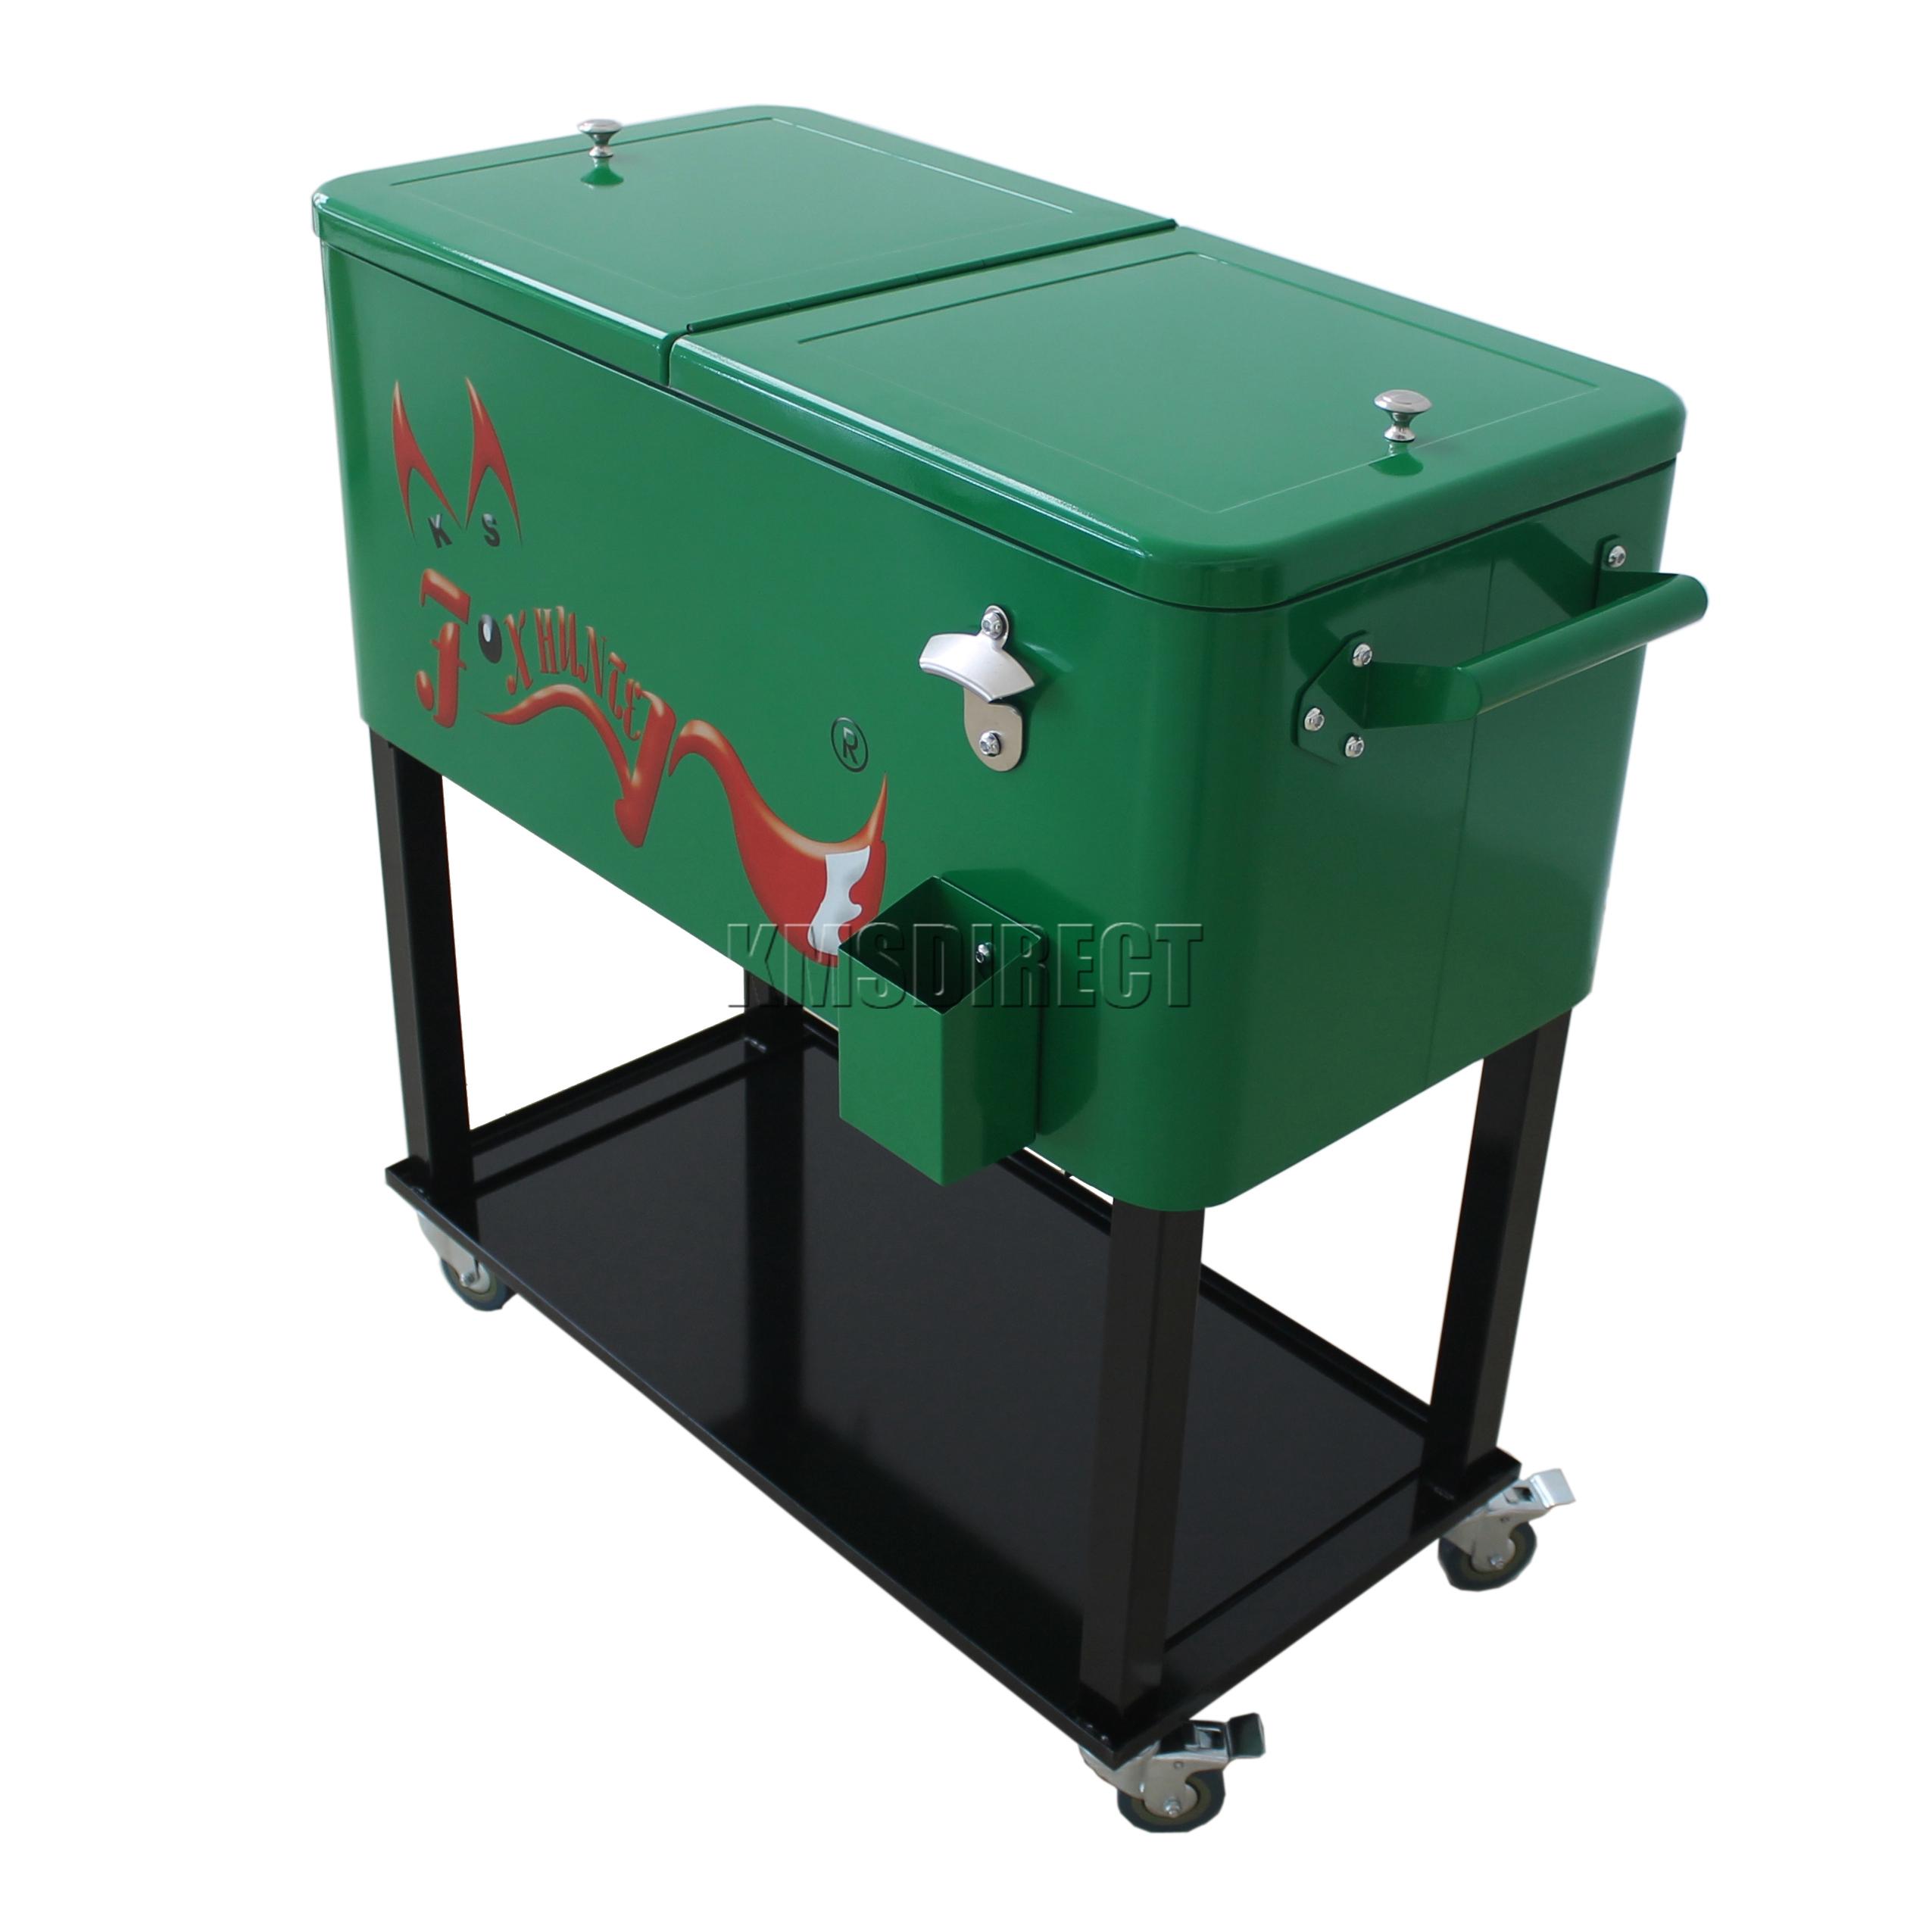 FoxHunter Patio Deck Ice Cooler Rolling Cart Outdoor 65